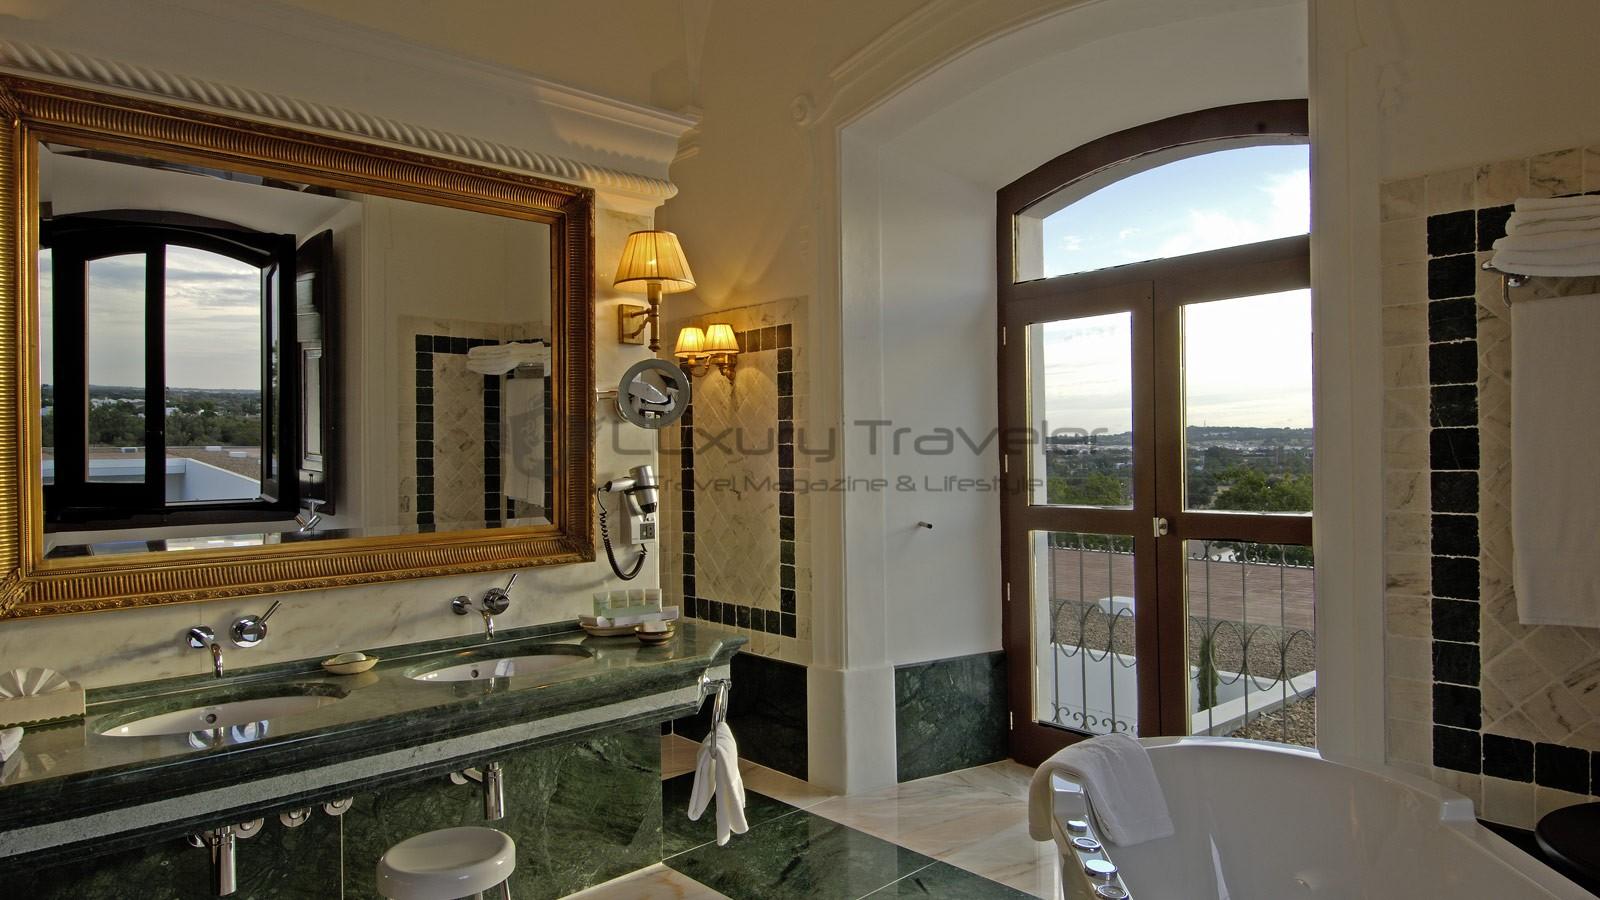 Convento_Espinheiro_Hotel_Evora_Starwood_Royal_Suite_philippe-stark